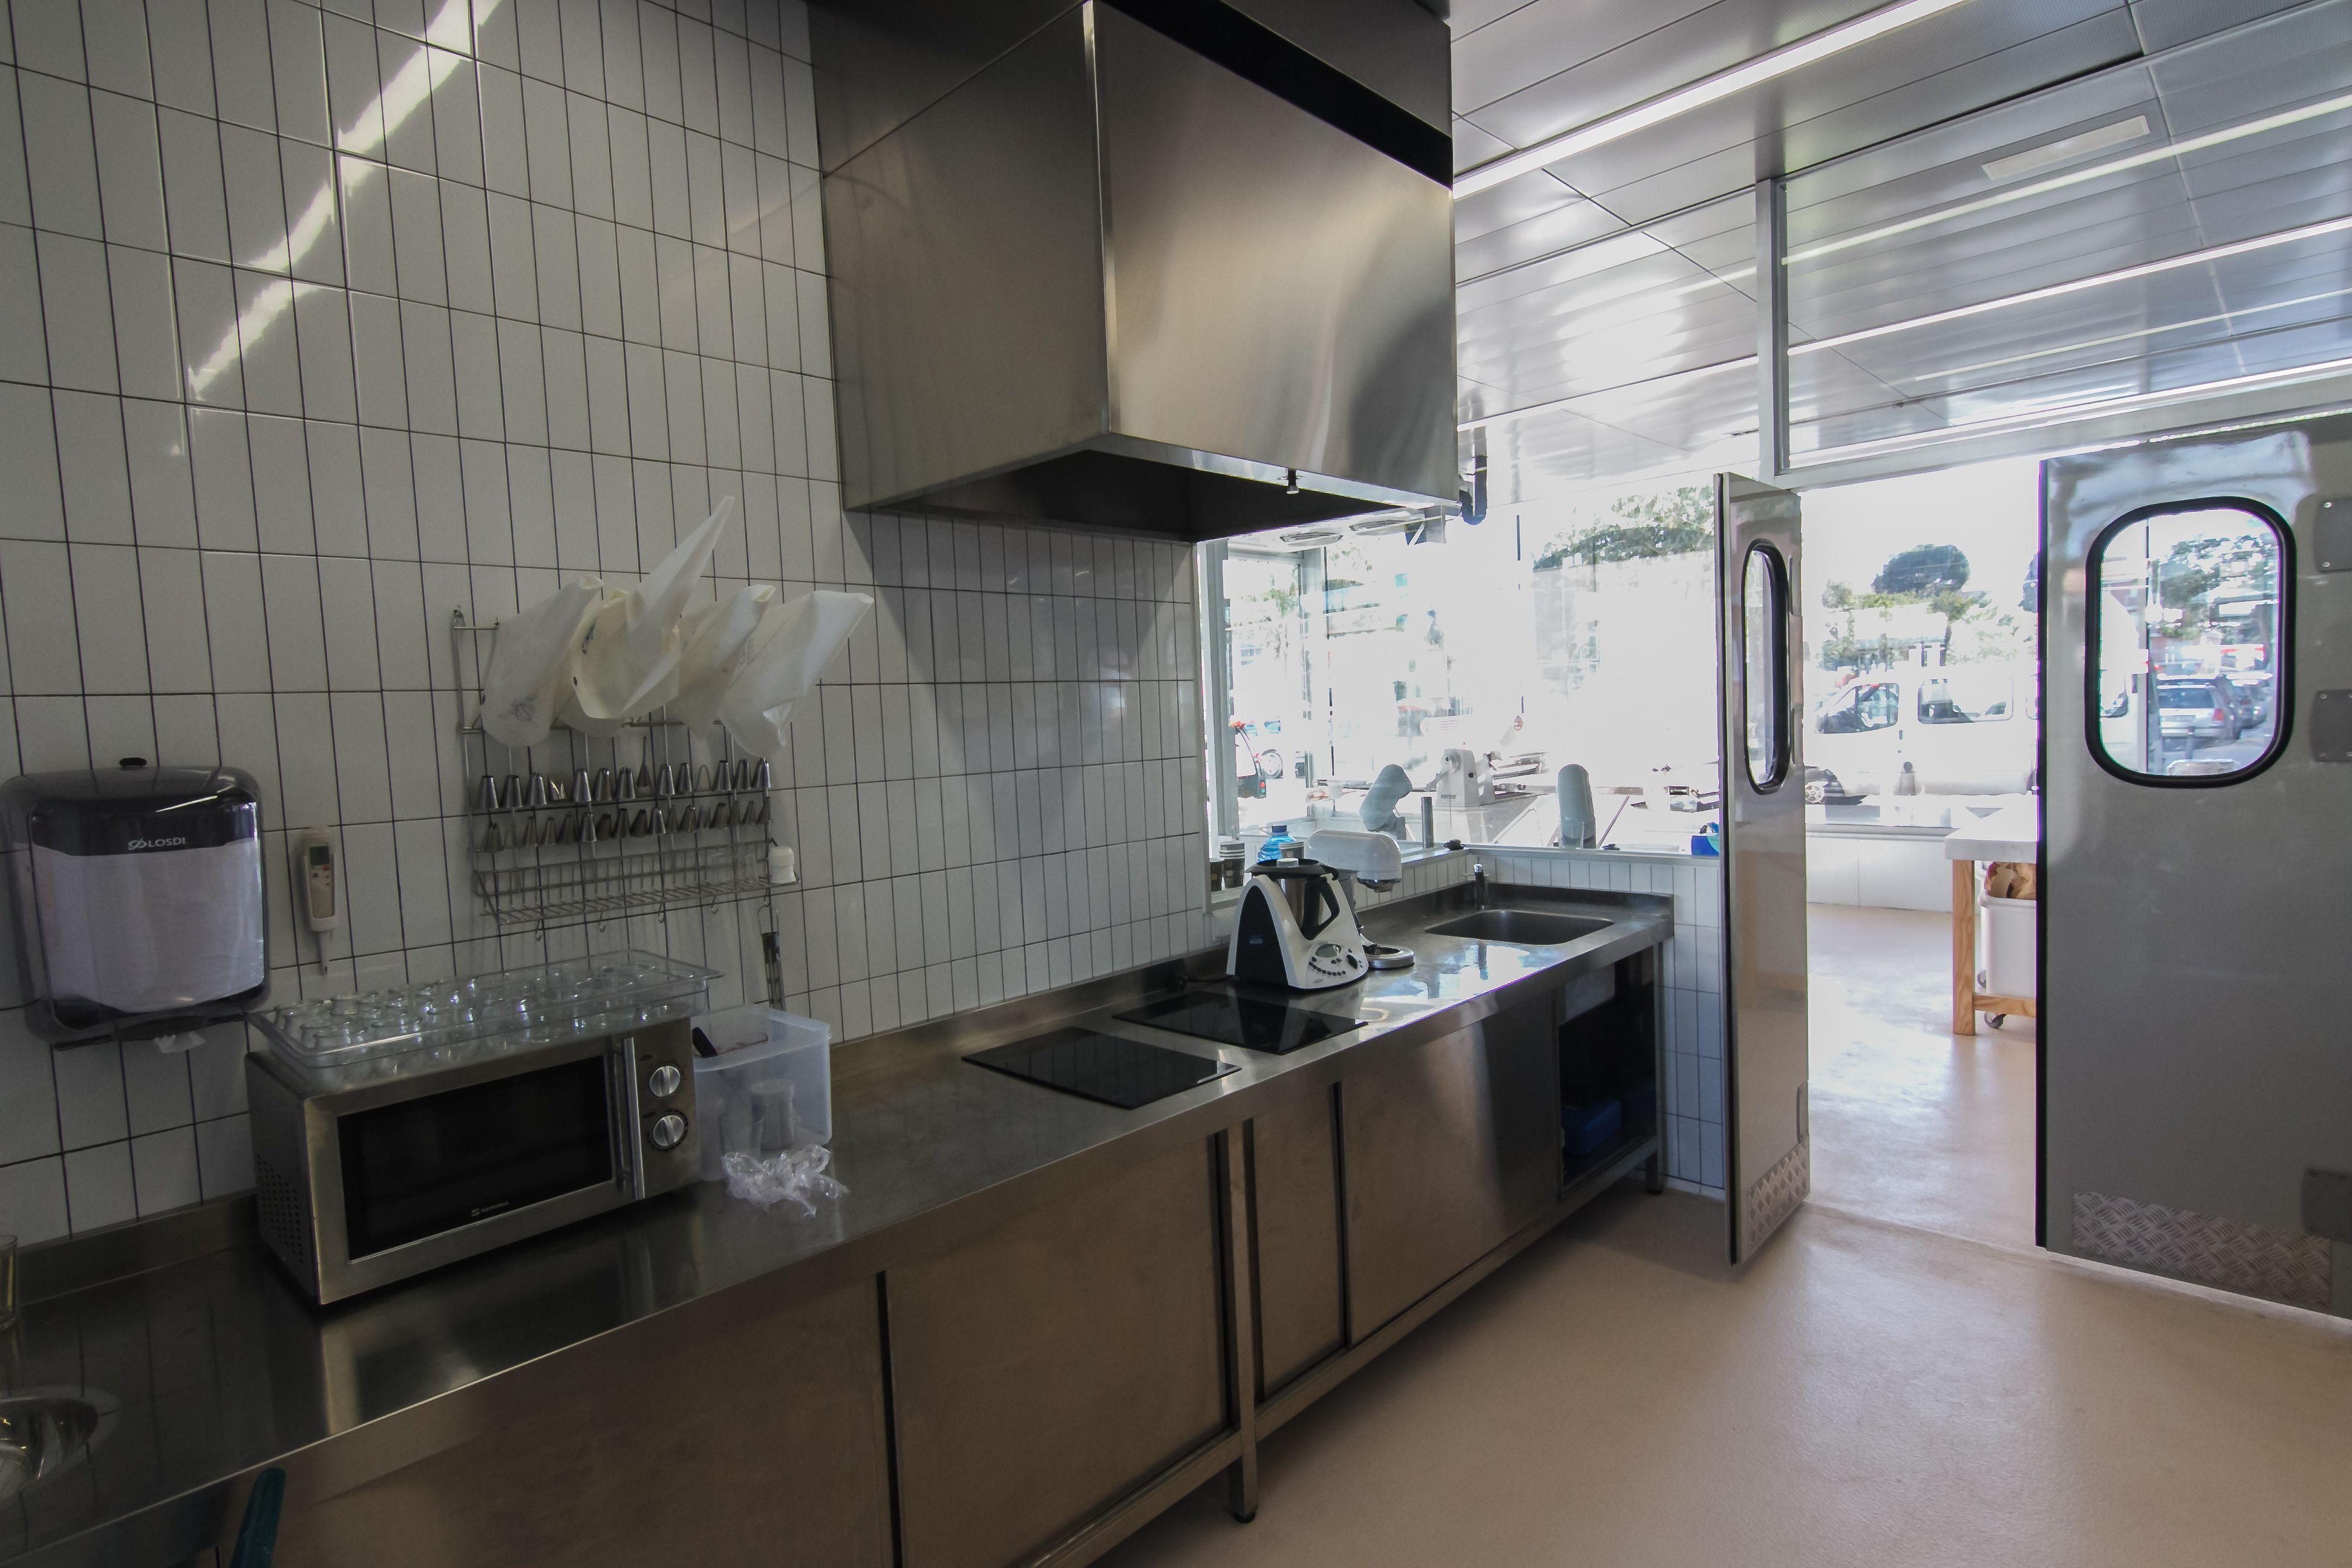 Cuarto frío dentro de cocina de formación en Esment Escola ...